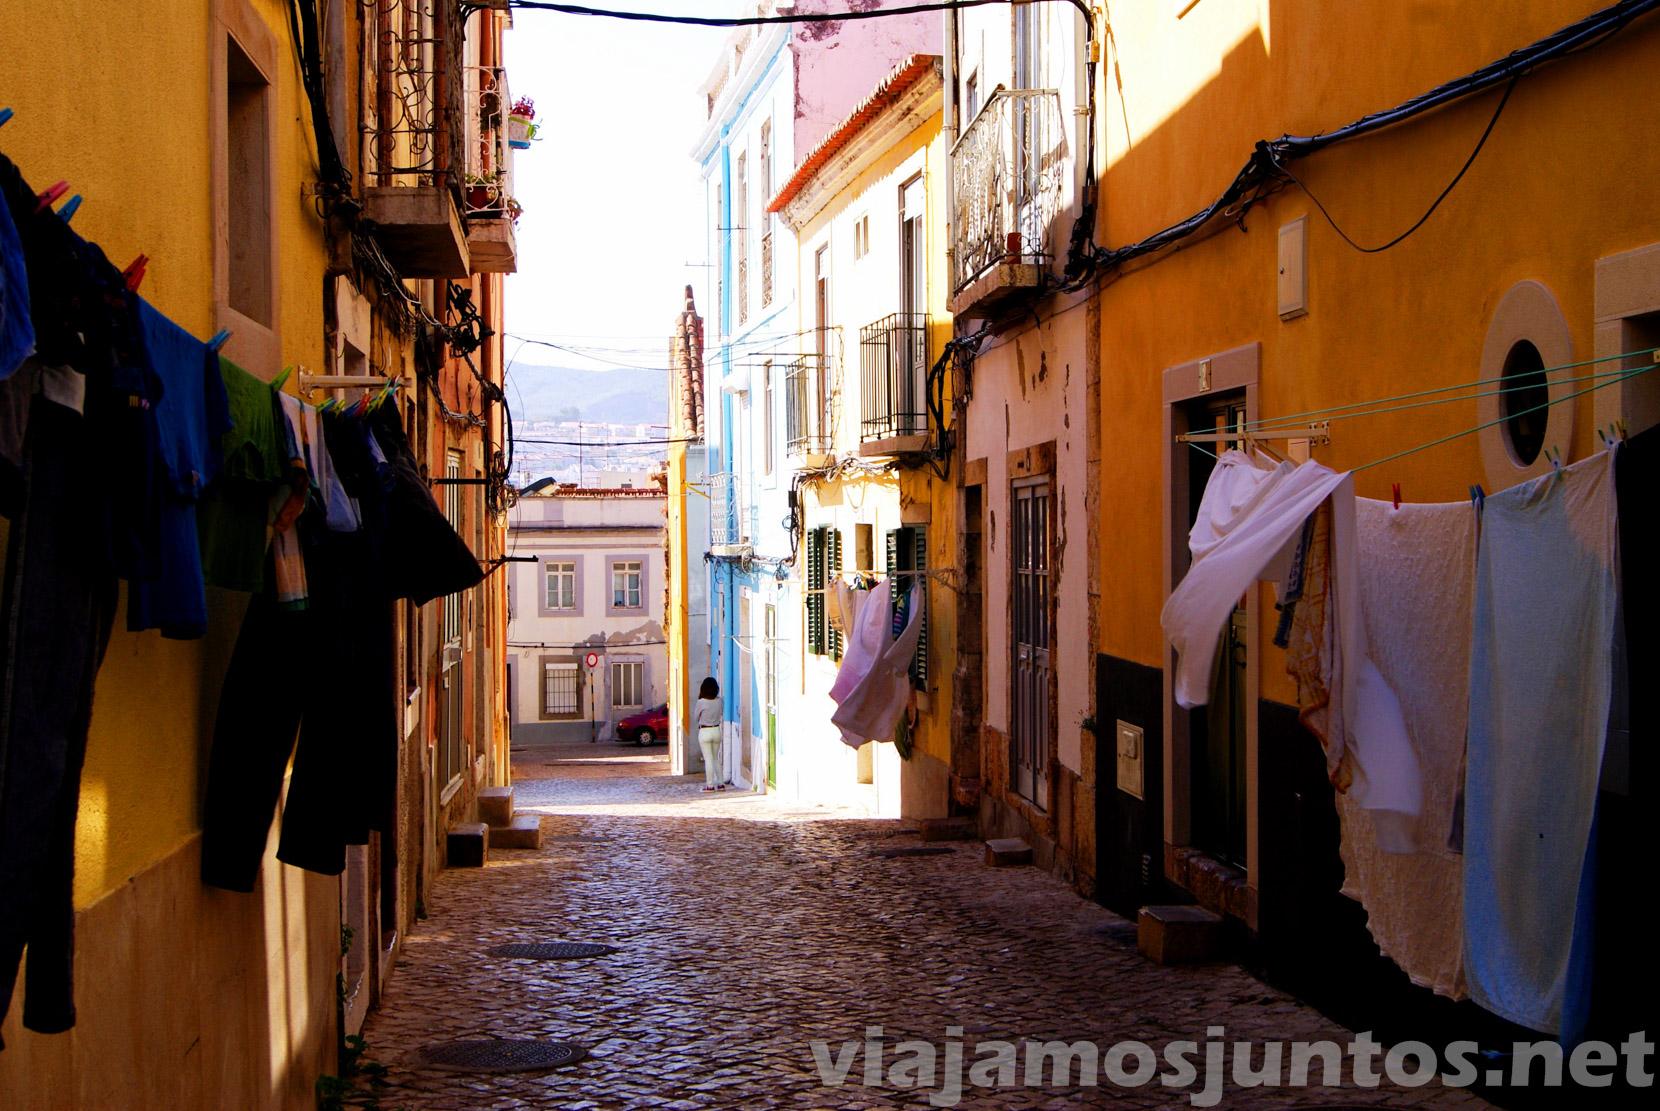 Las calles de Setubal, Portugal